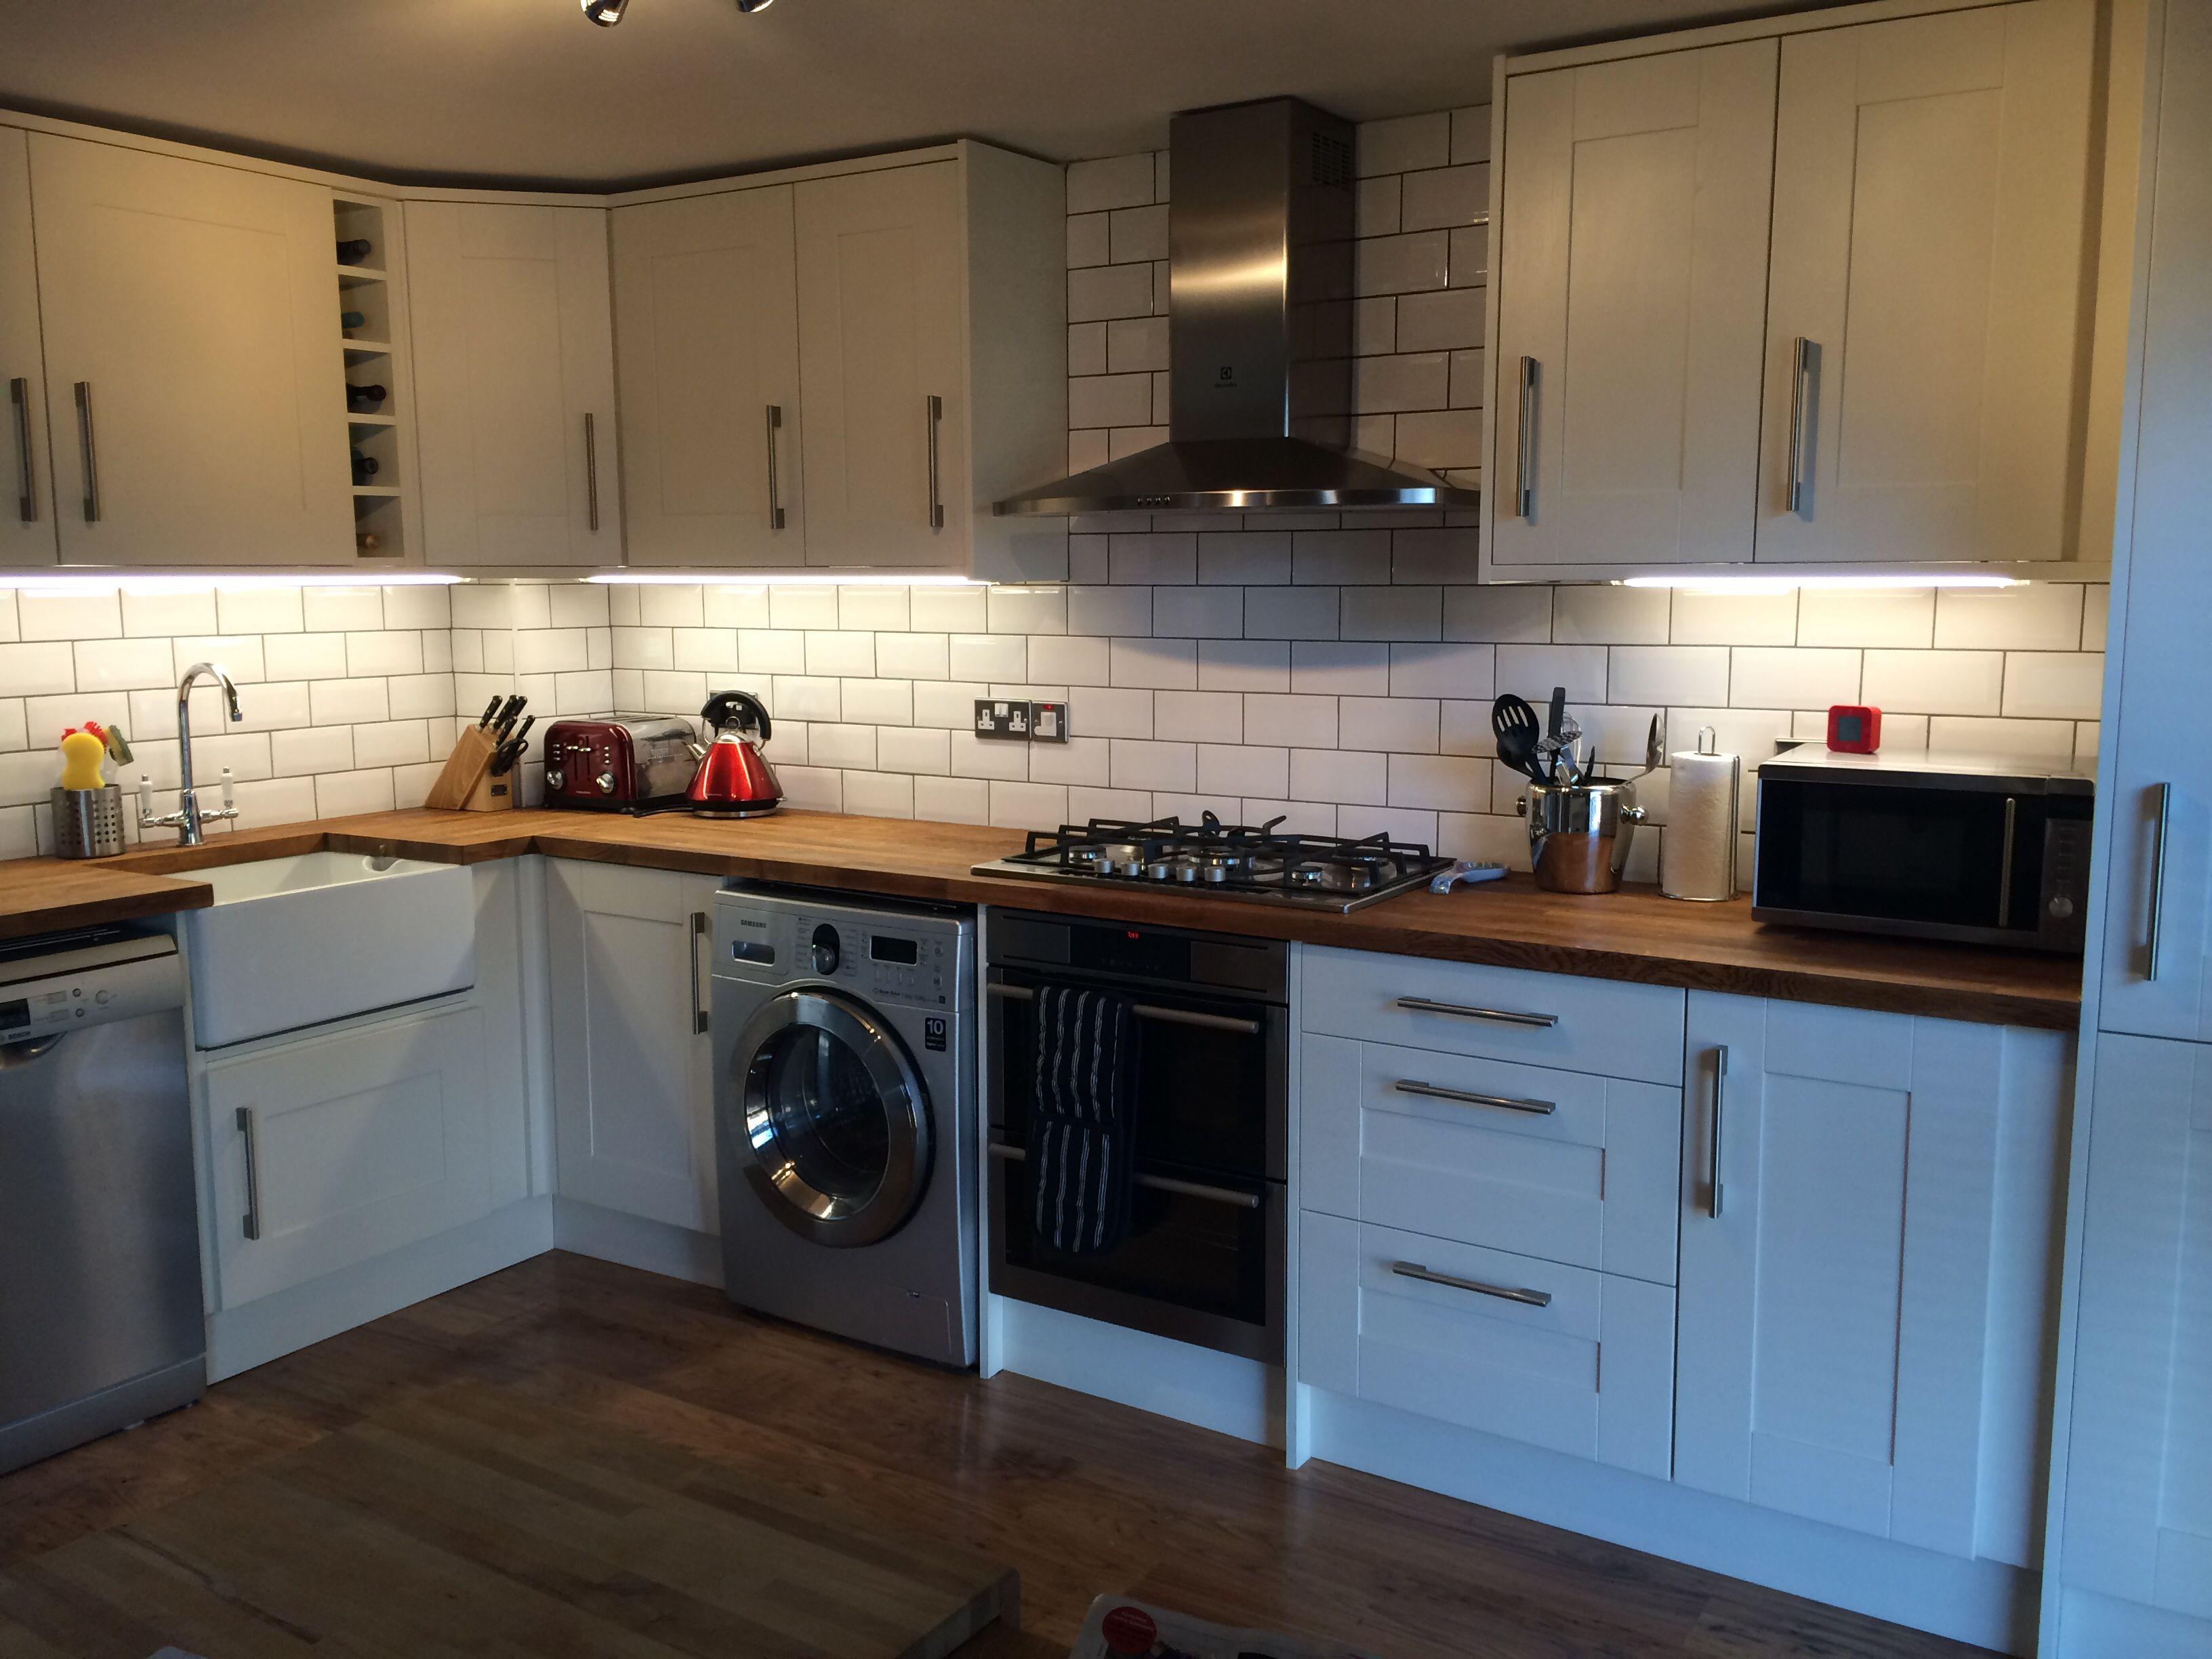 wickes tiverton bone kitchen with white ceramic bevelled. Black Bedroom Furniture Sets. Home Design Ideas